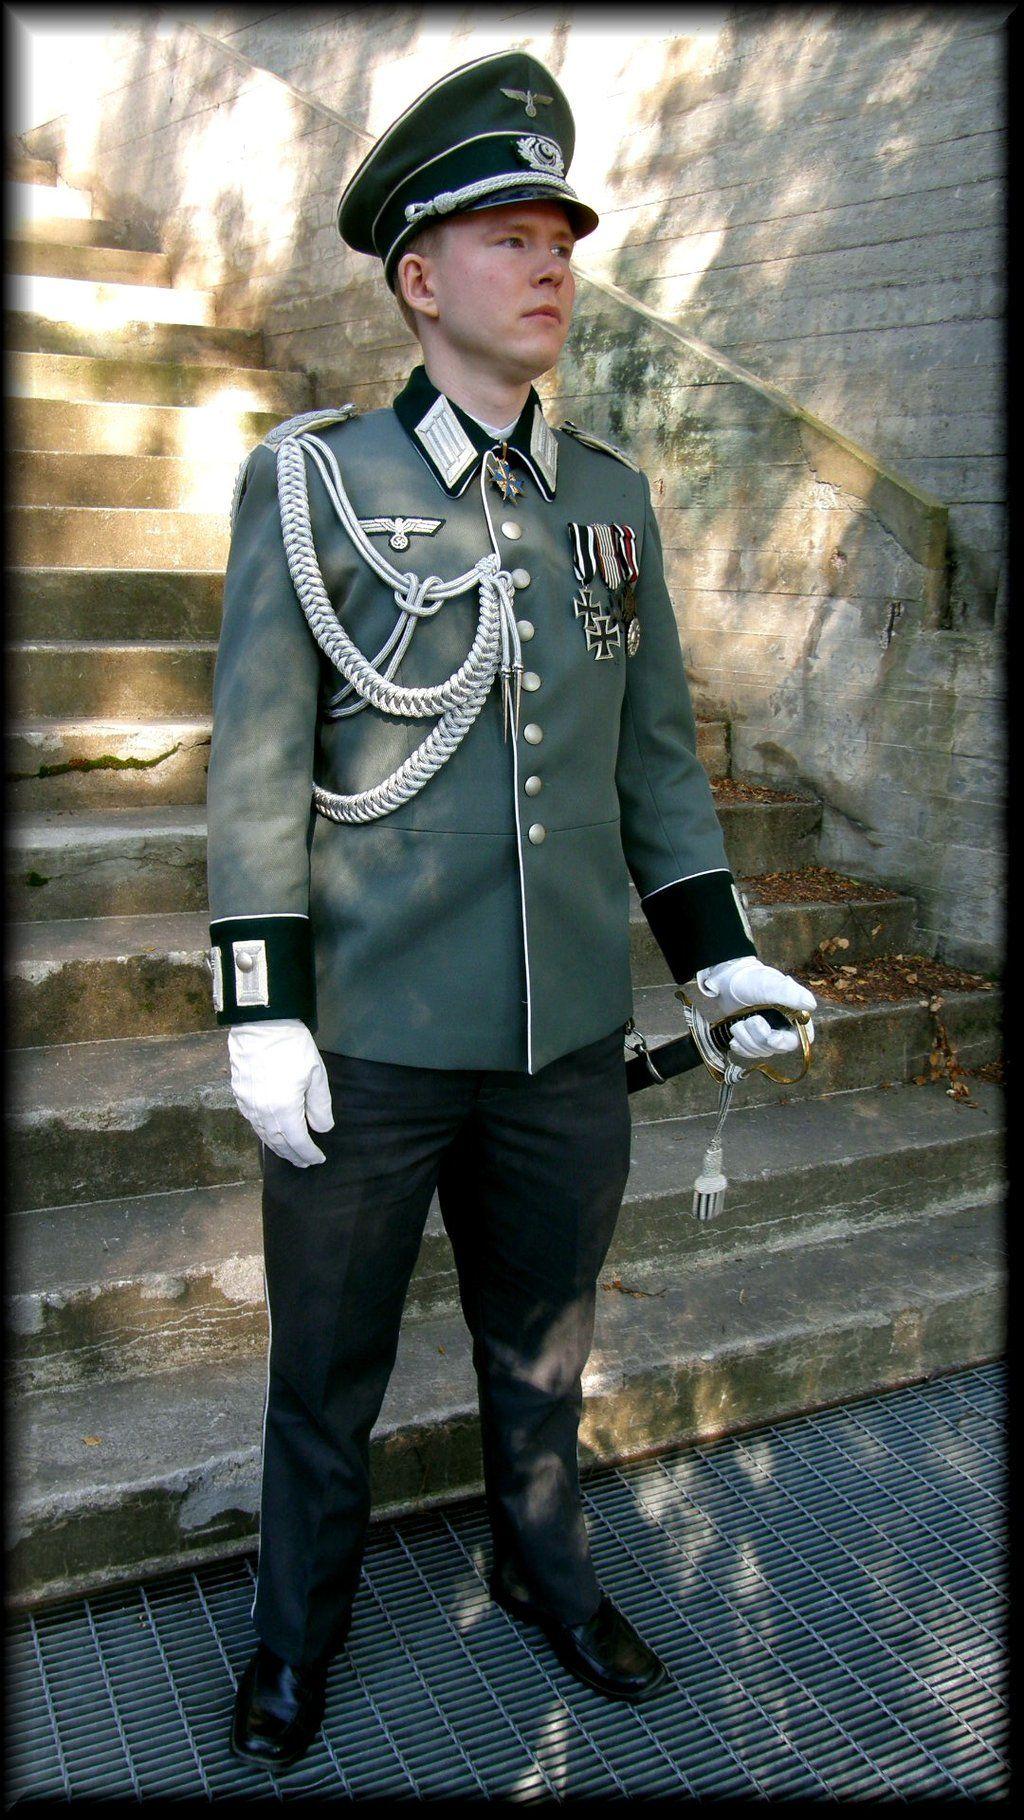 wehrmacht dress uniform wwwimgkidcom the image kid